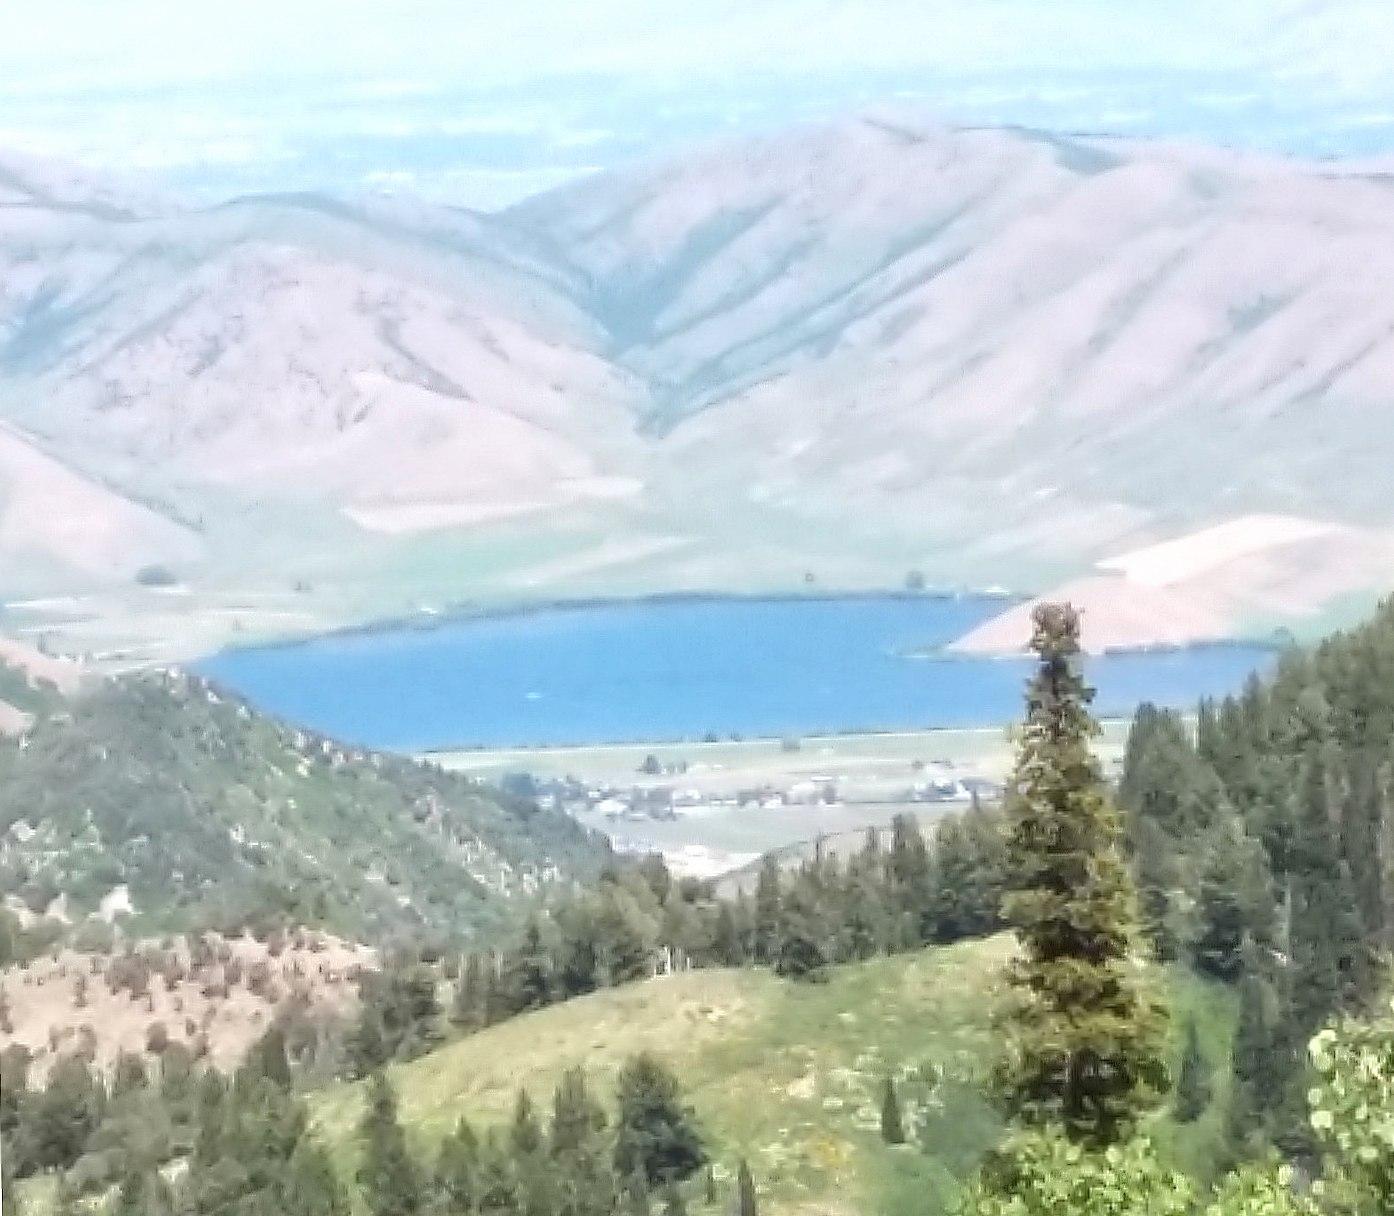 Lake view wallpapers HD quality